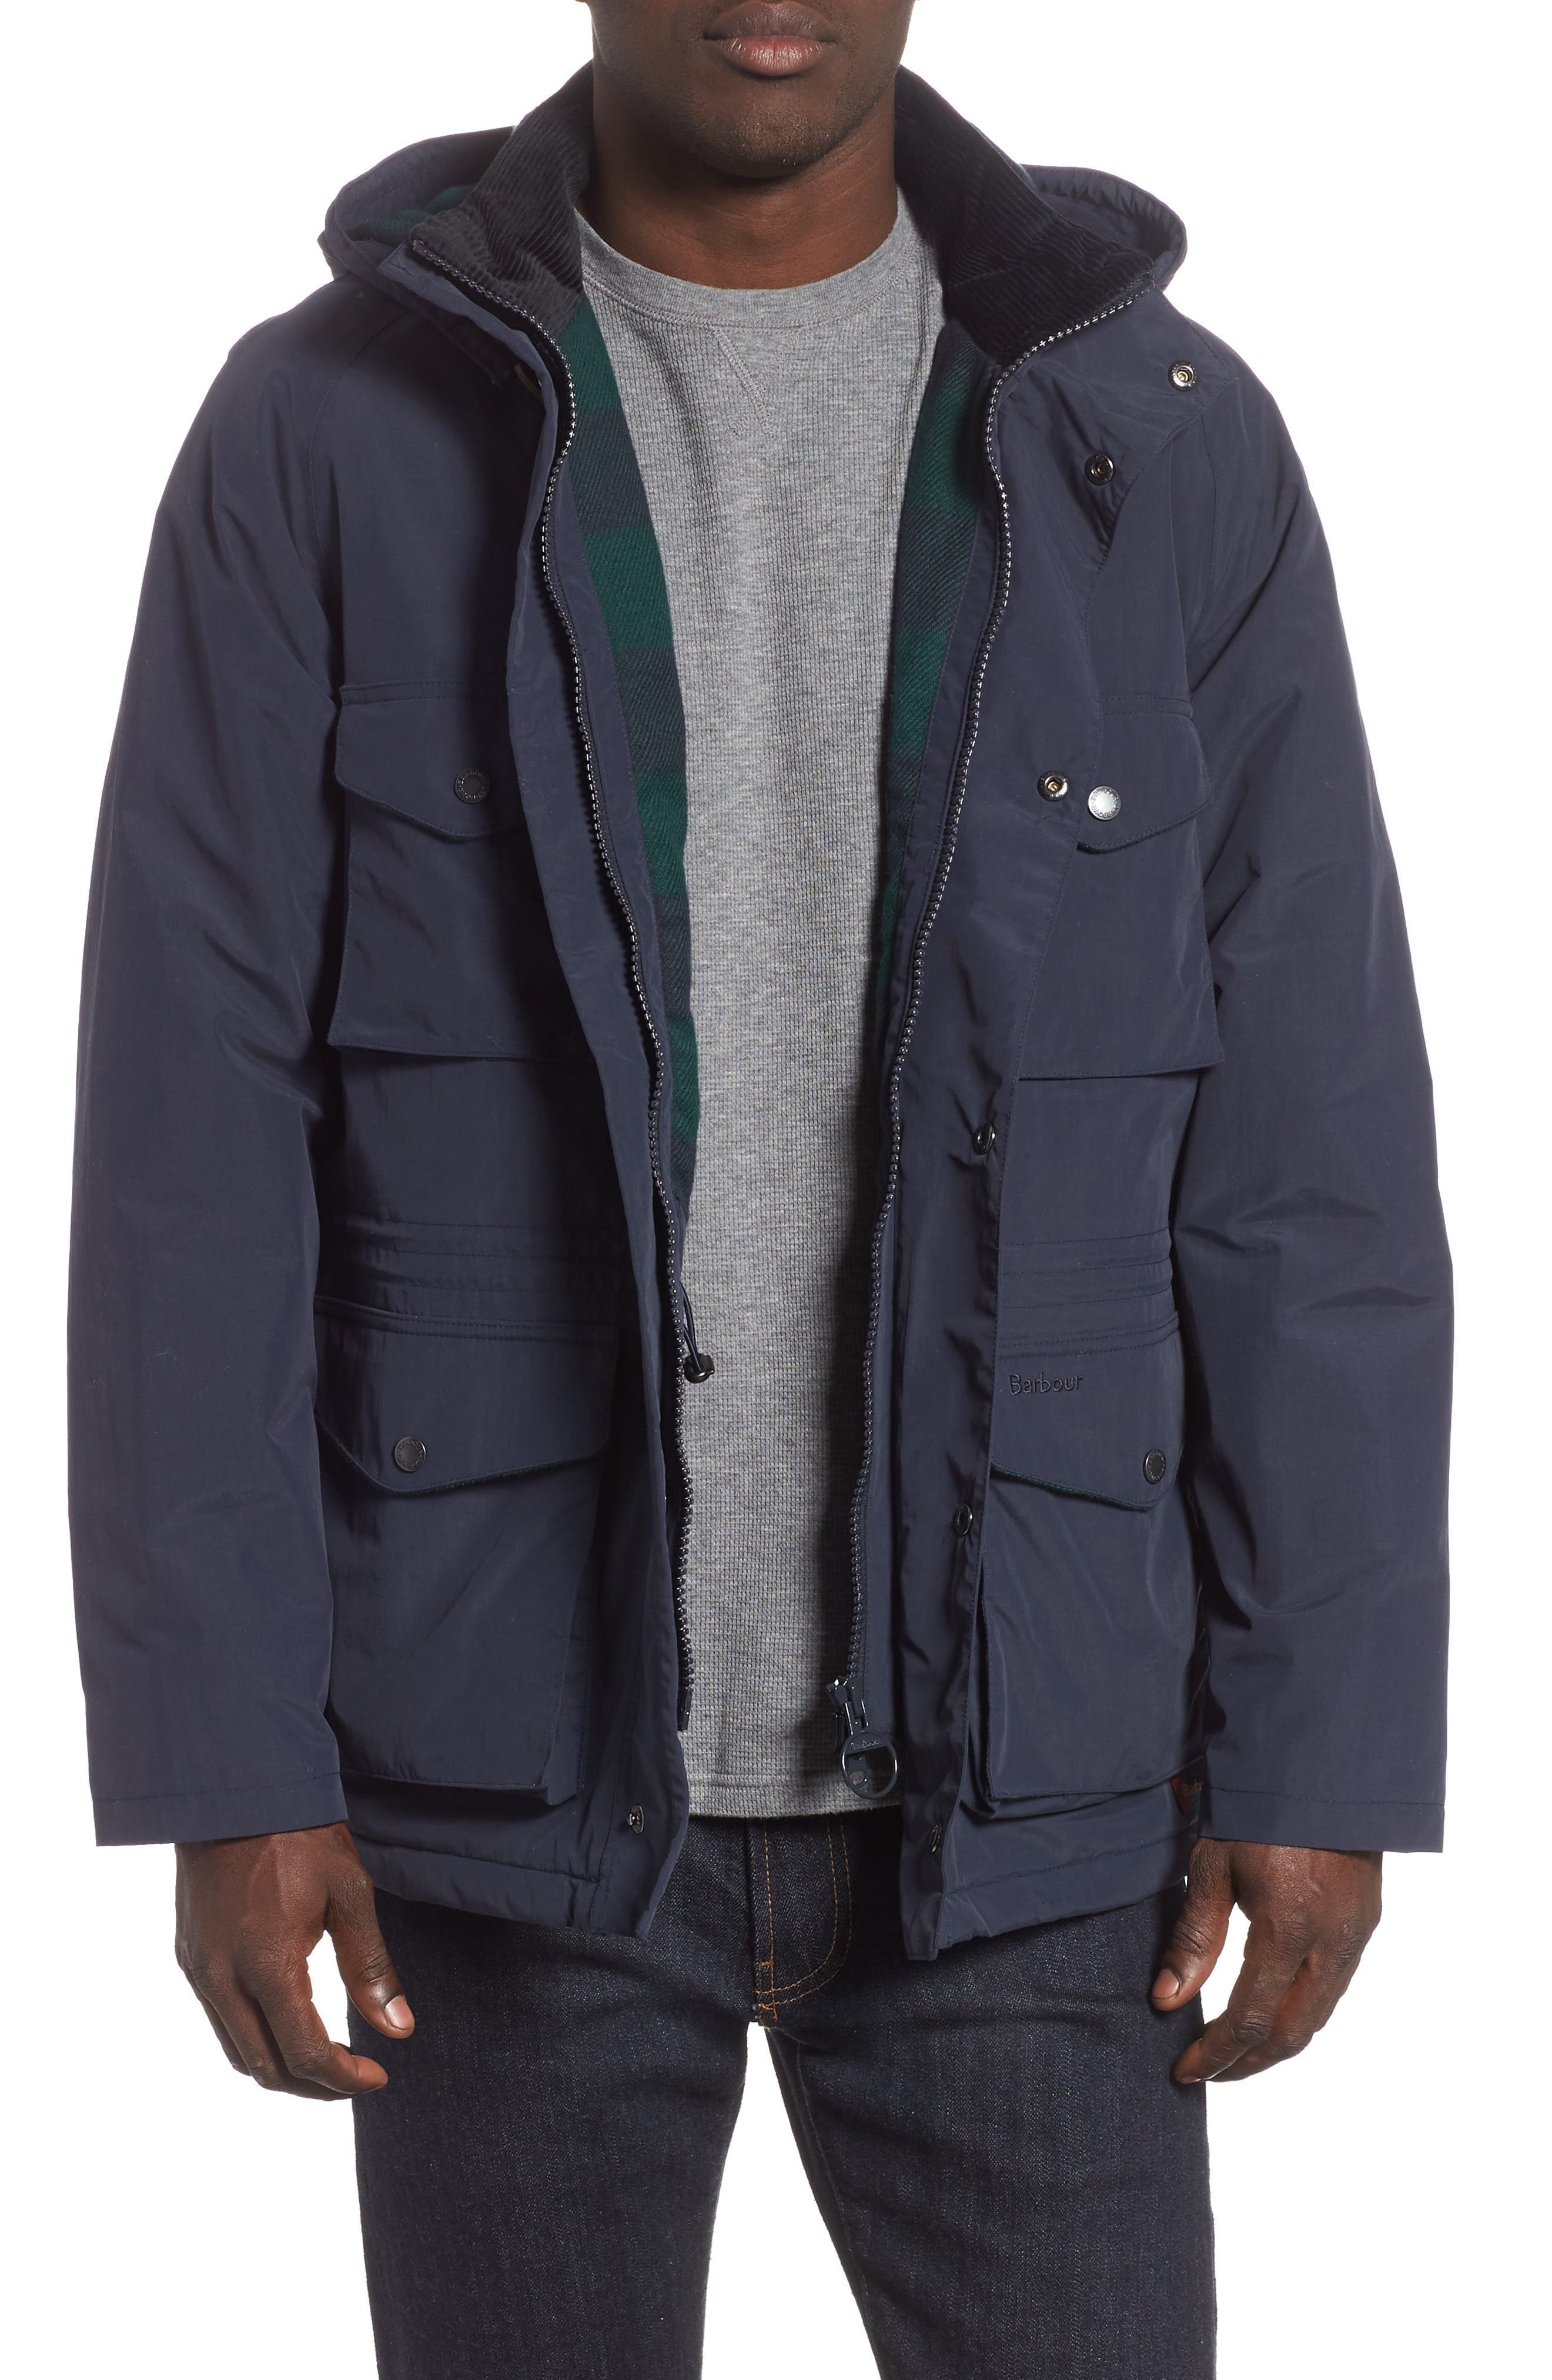 BARBOUR, Tiree Waterproof Jacket, Main thumbnail 1, color, 410